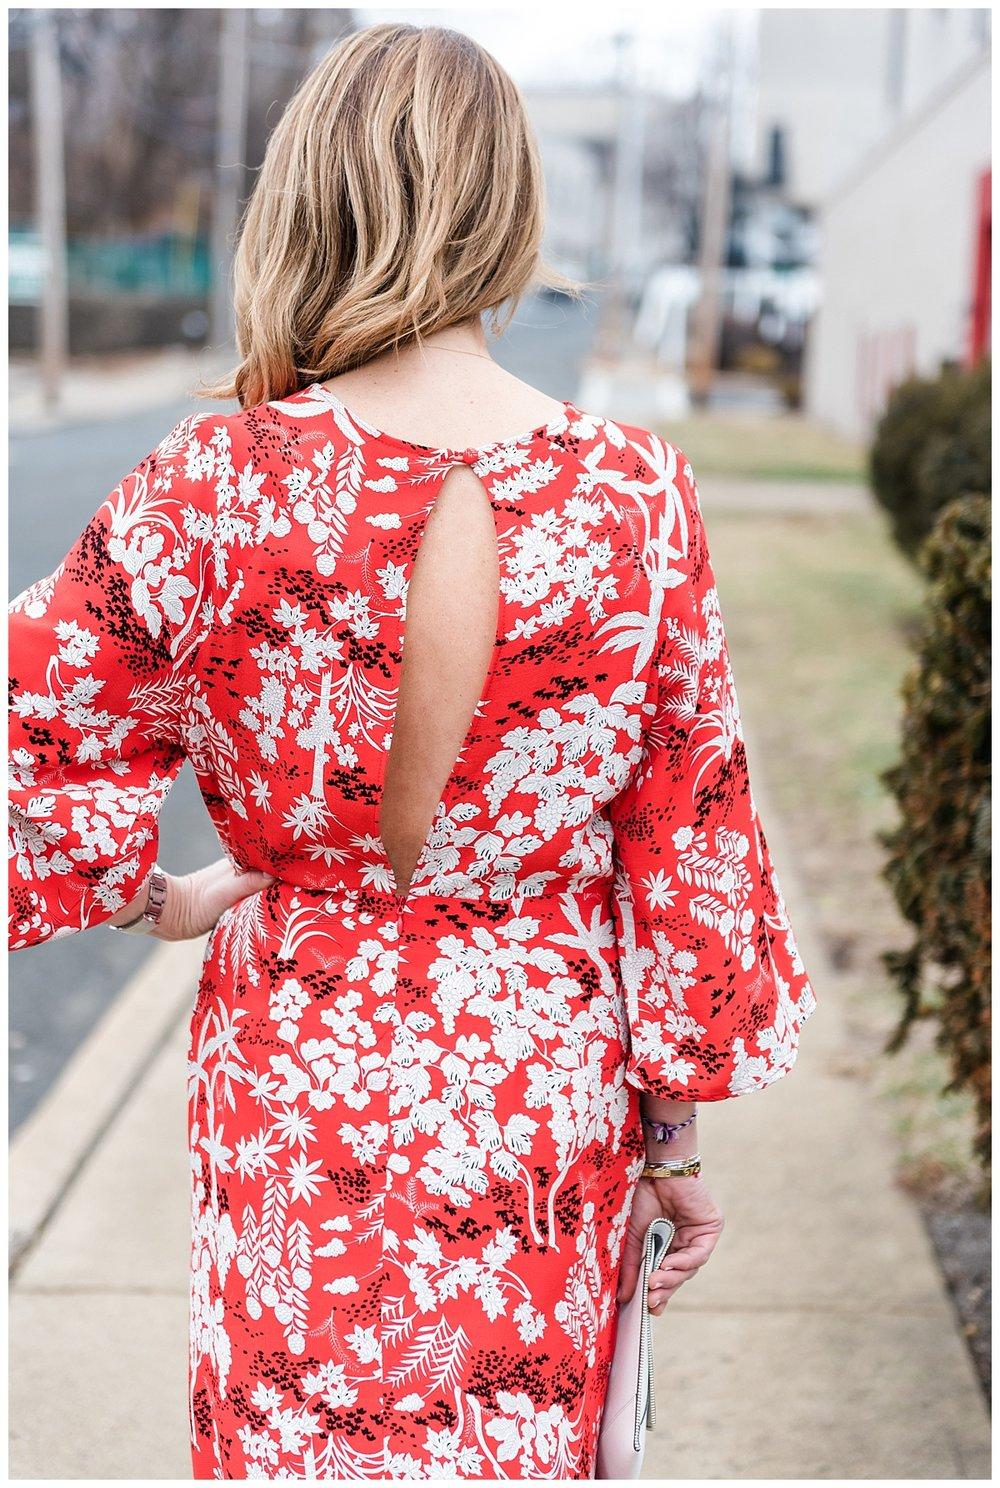 Red floral dress_1109.jpg